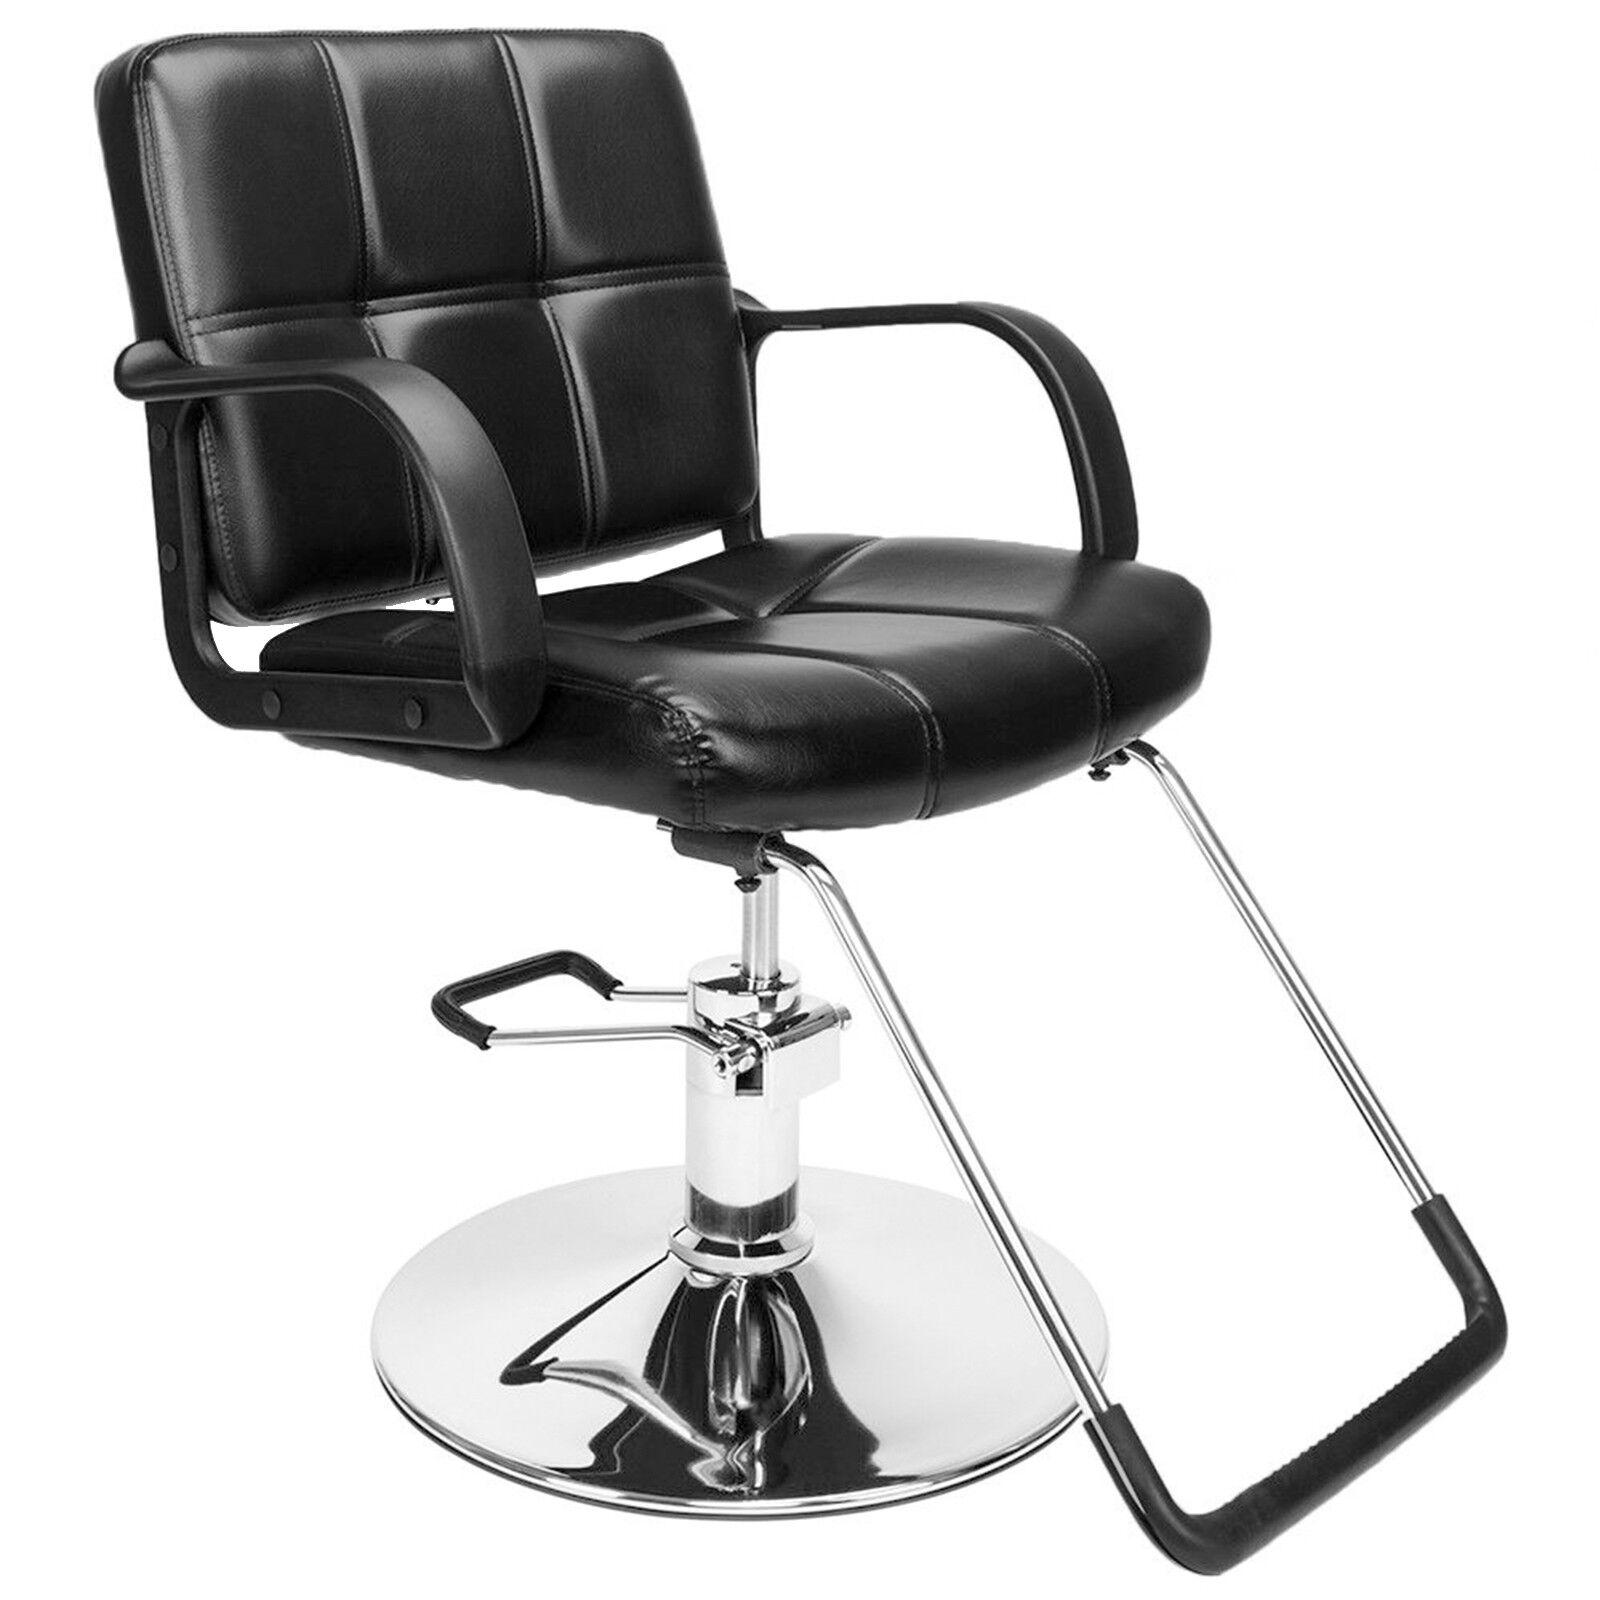 8d92ec3f20 Black Classic Hydraulic Barber Chair Salon Beauty Shampoo Hair ...